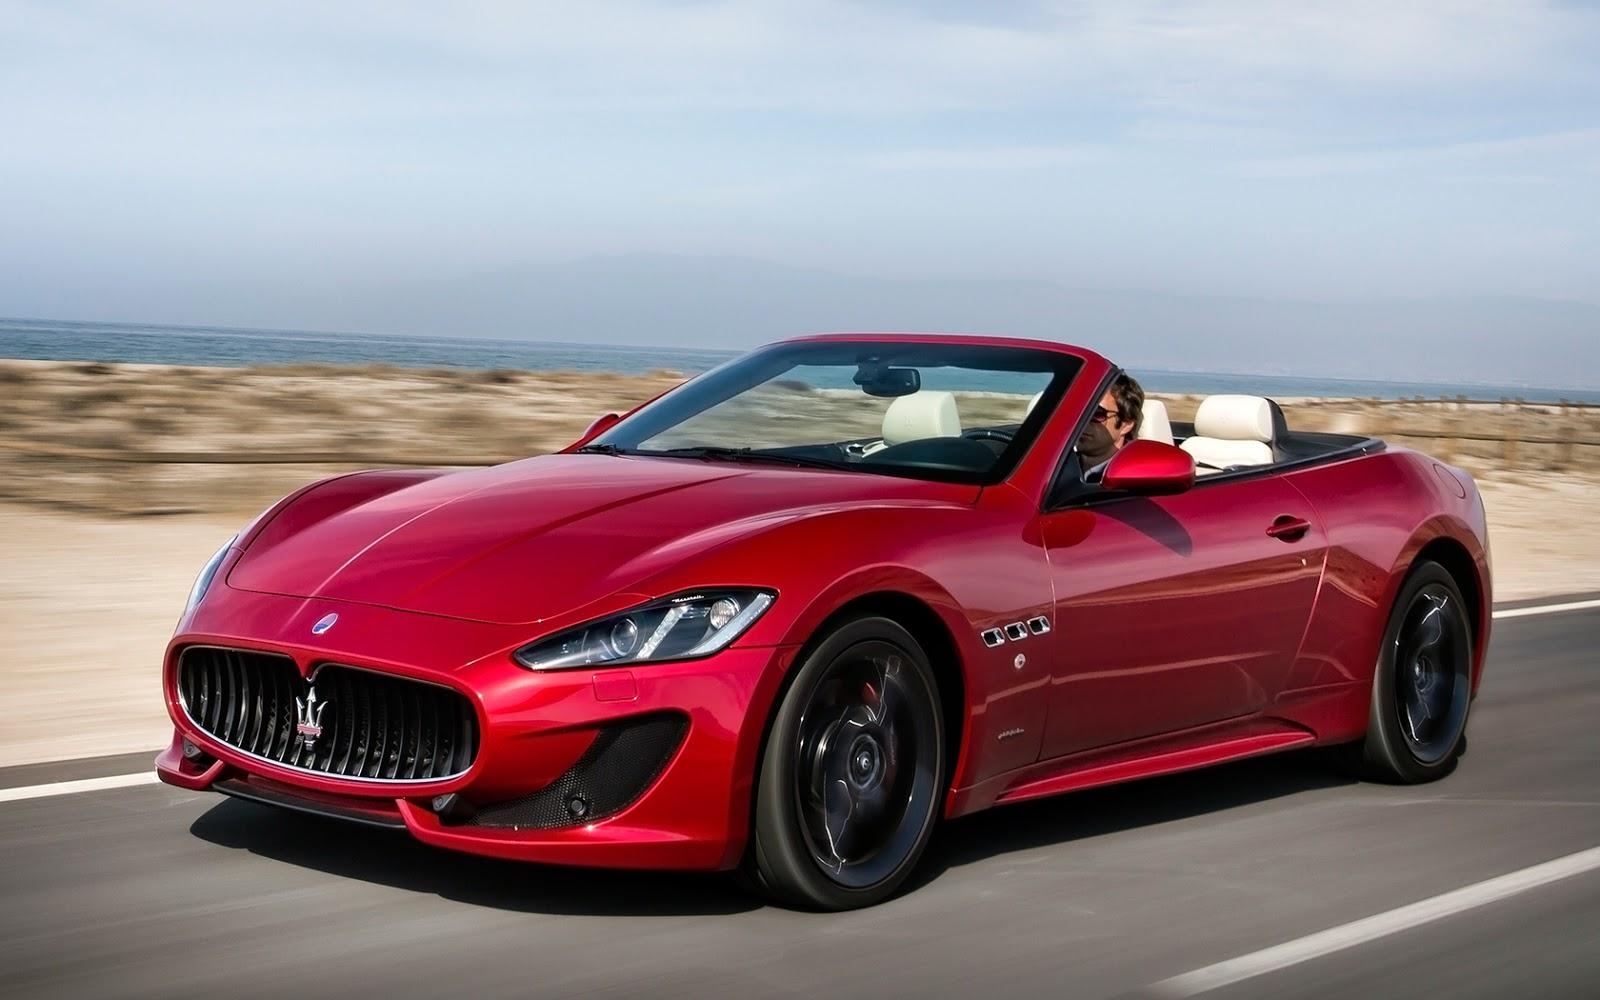 http://2.bp.blogspot.com/-75XO_uFI8a0/UNmmF7dQpEI/AAAAAAAAALk/L-_YRM8H7MA/s1600/Maserati+Granturismo+Wallpaper+HD.jpg